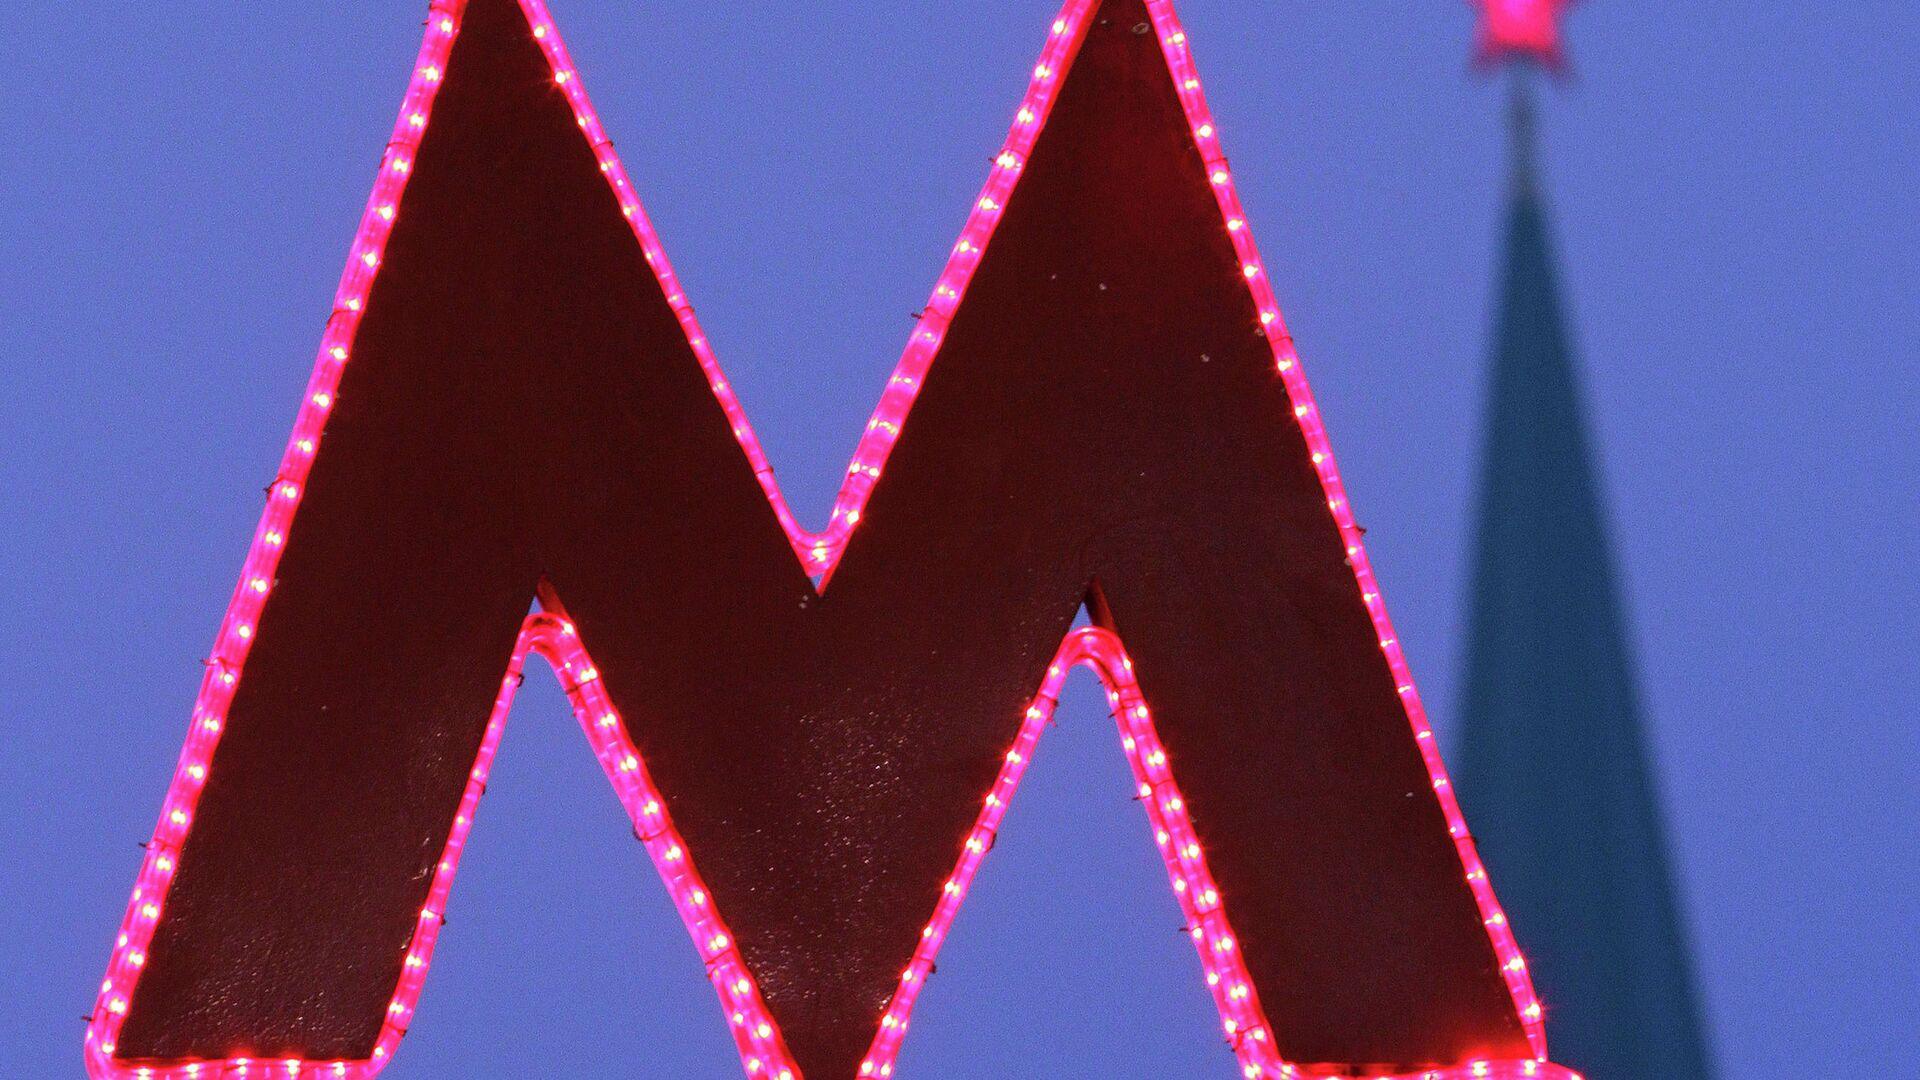 Знак метрополитена в Москве. Архивное фото - РИА Новости, 1920, 15.07.2015